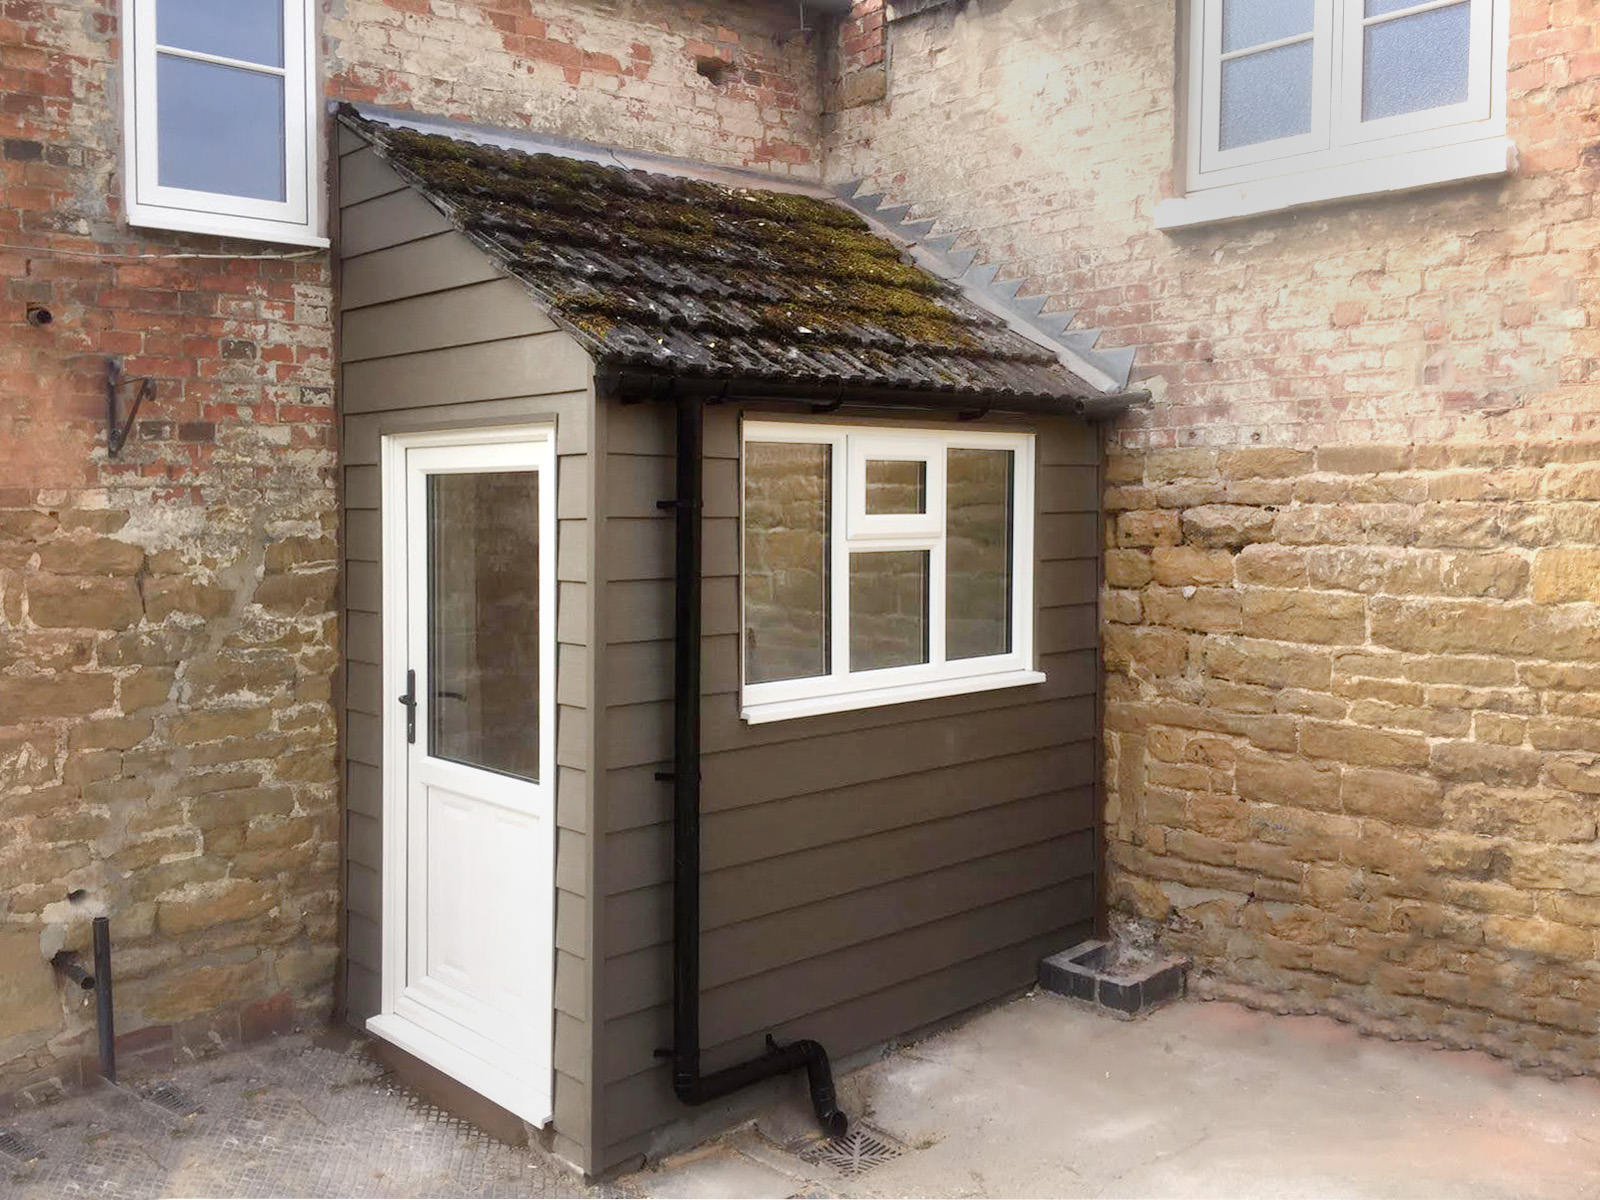 New Front Door and Porch